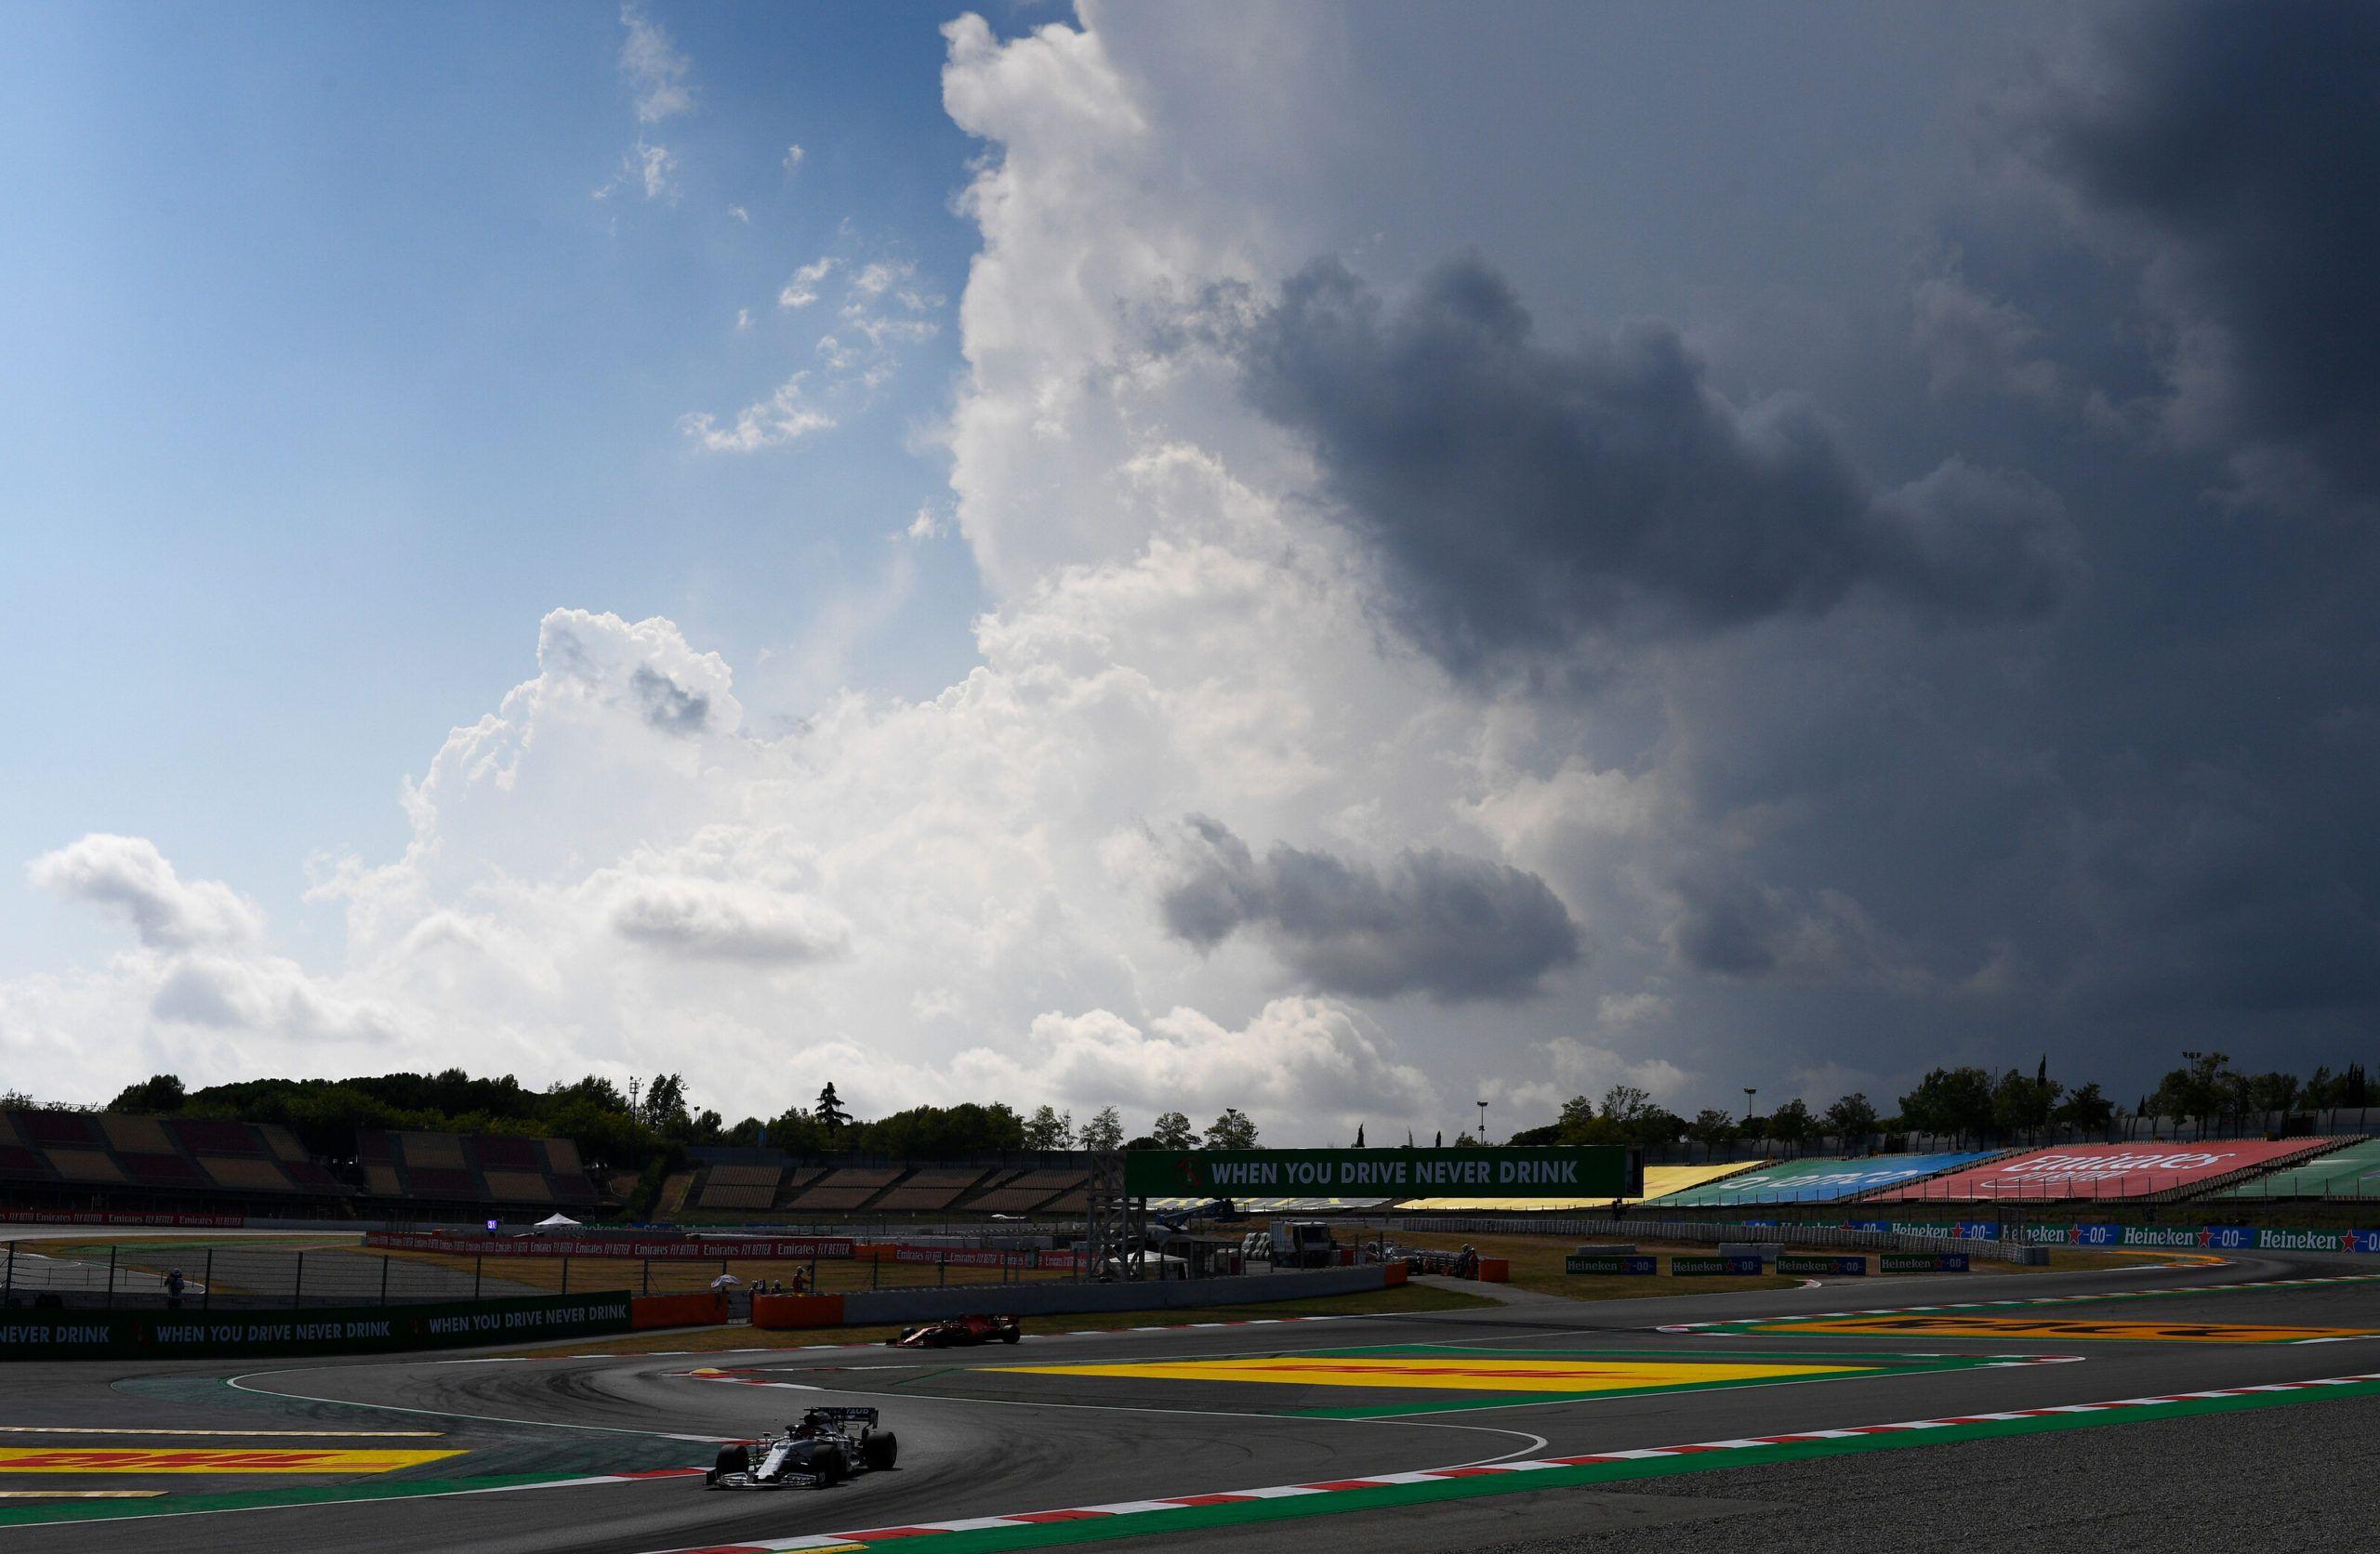 F1, FIA, Barcelona